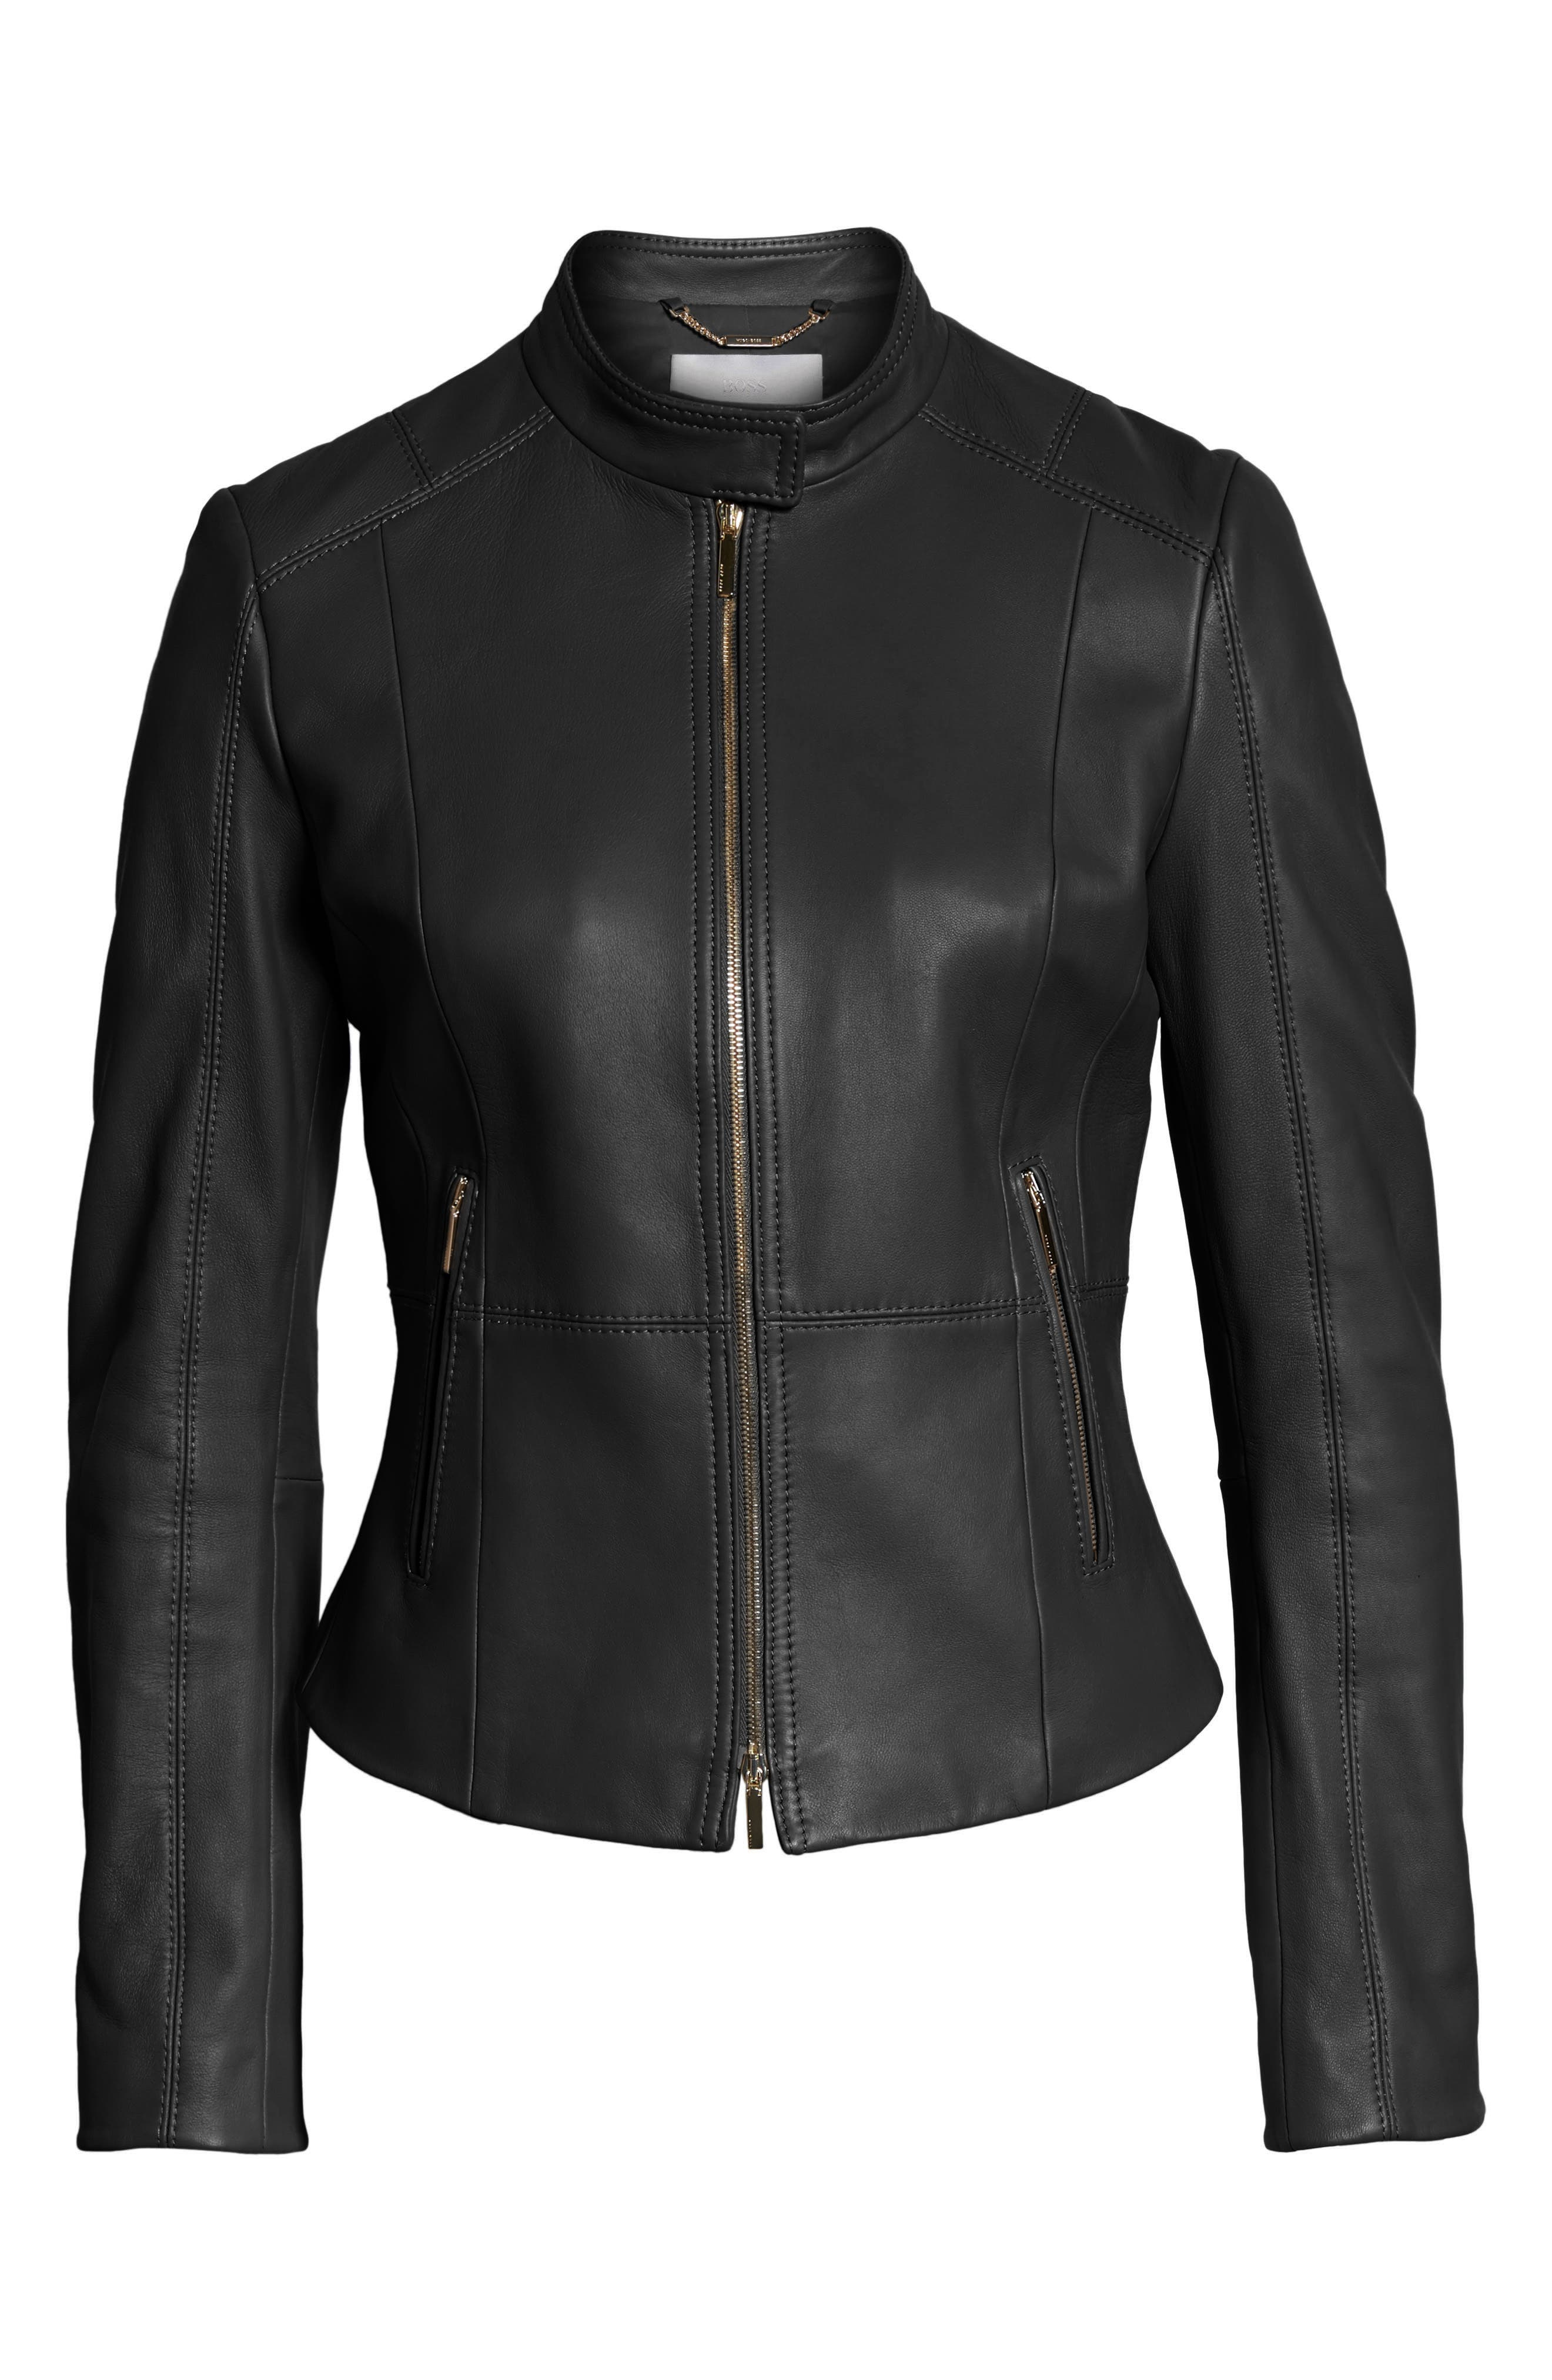 Sammonaie Leather Jacket,                         Main,                         color, Black